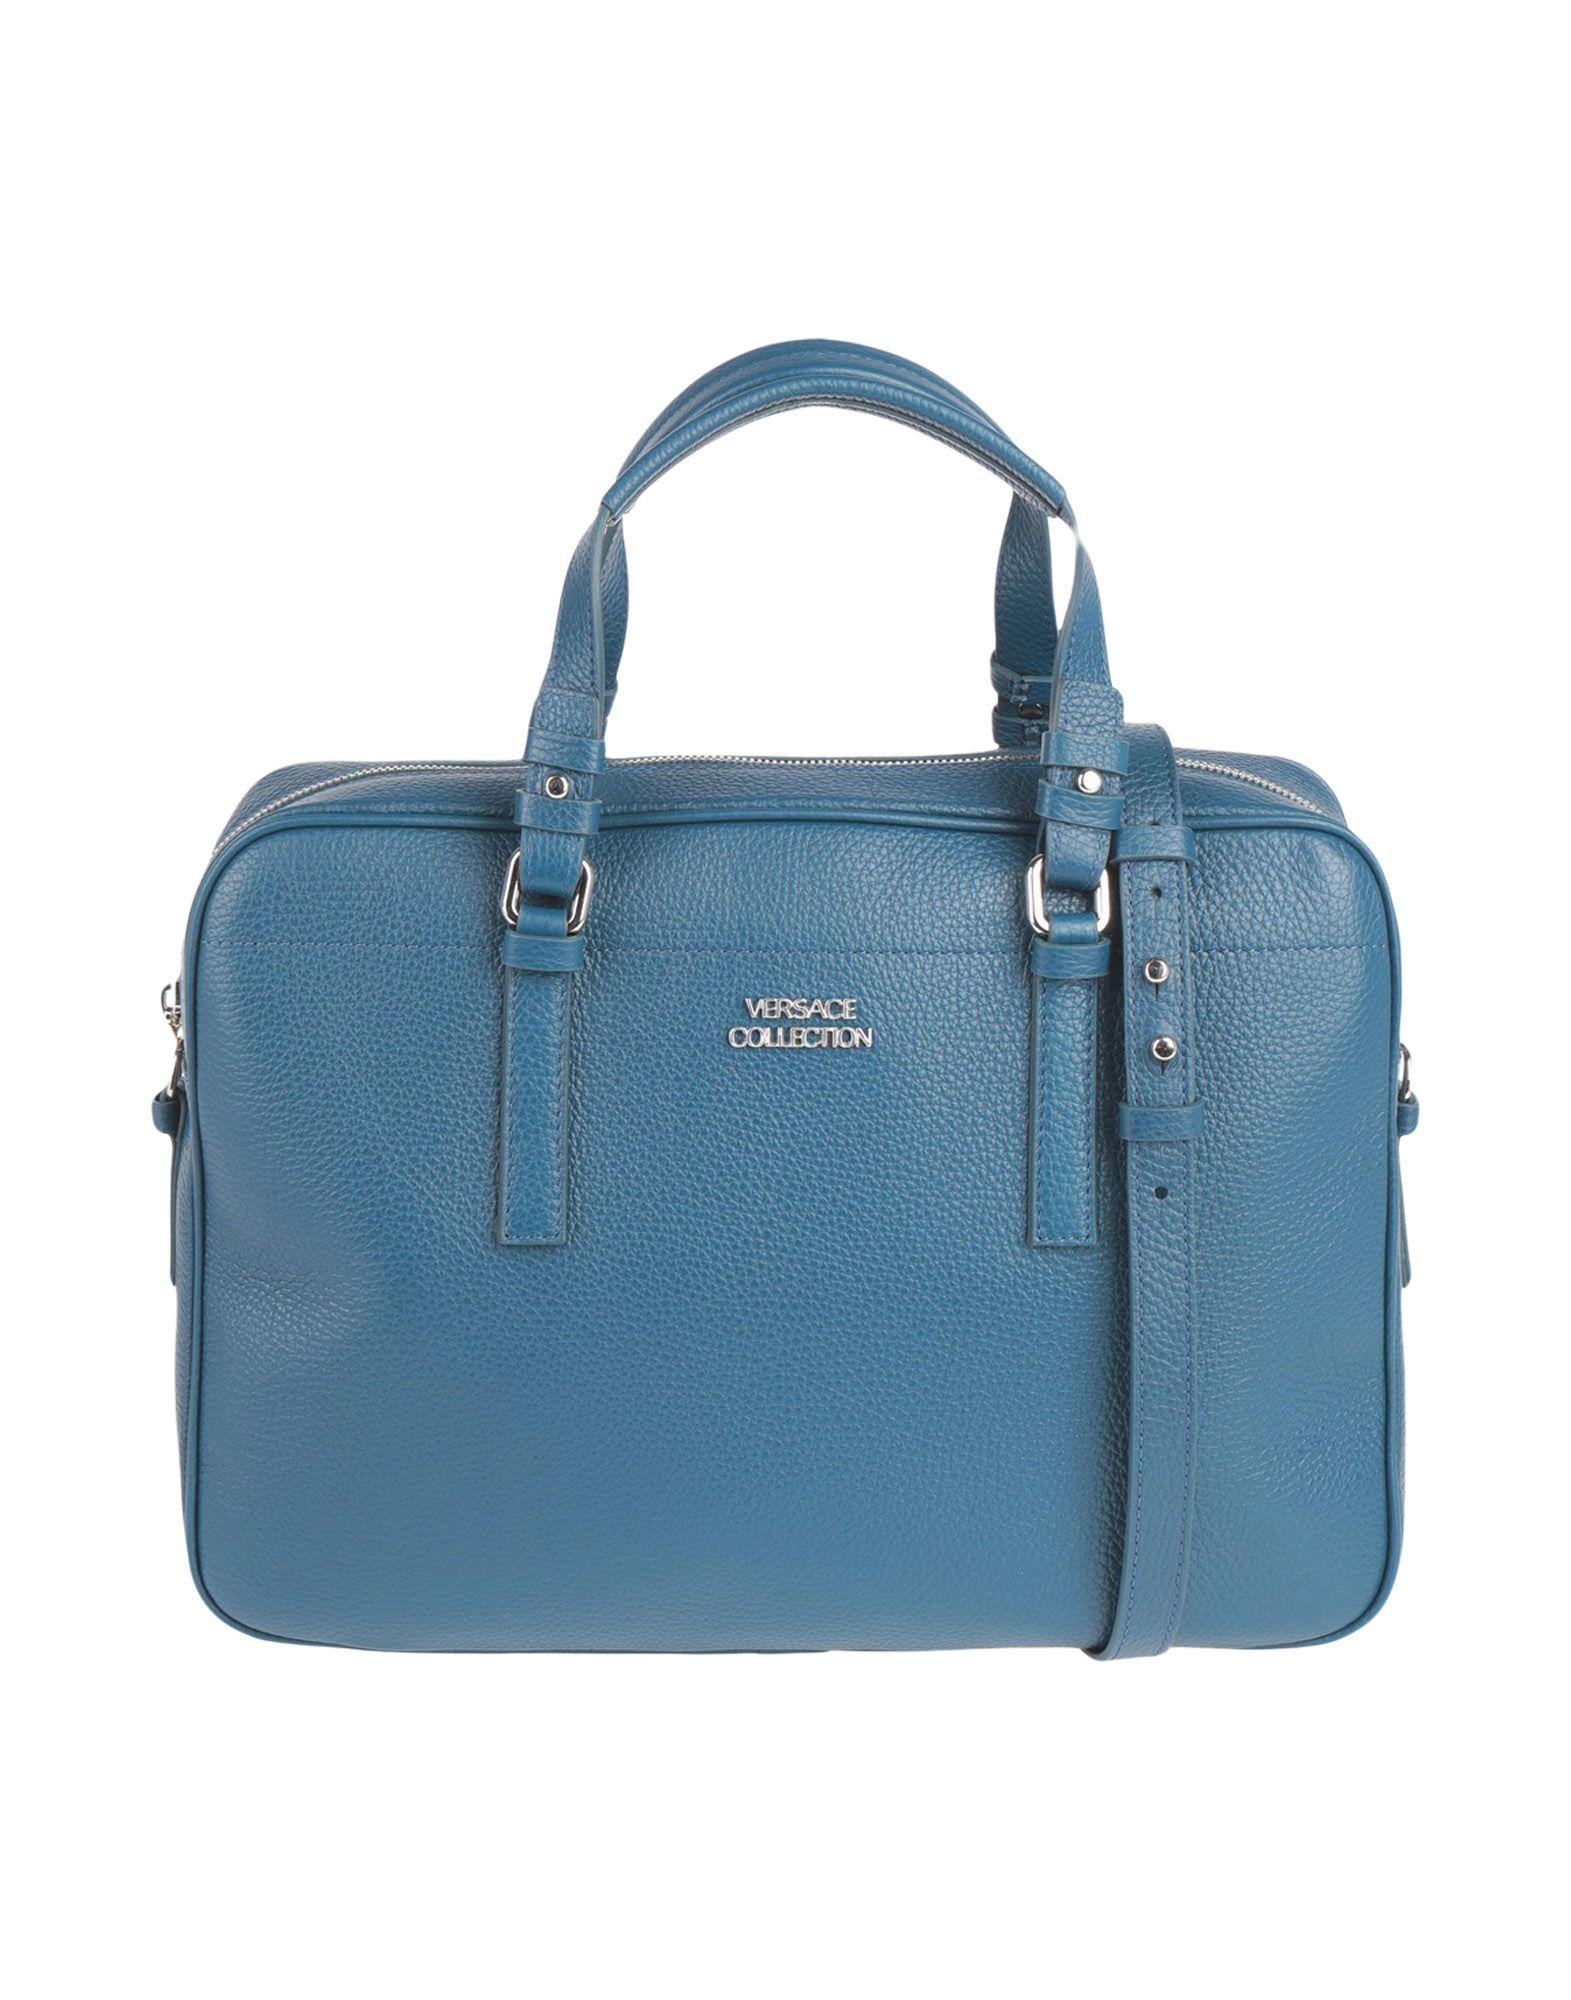 VERSACE COLLECTION Деловые сумки сумка vip collection сумки деловые